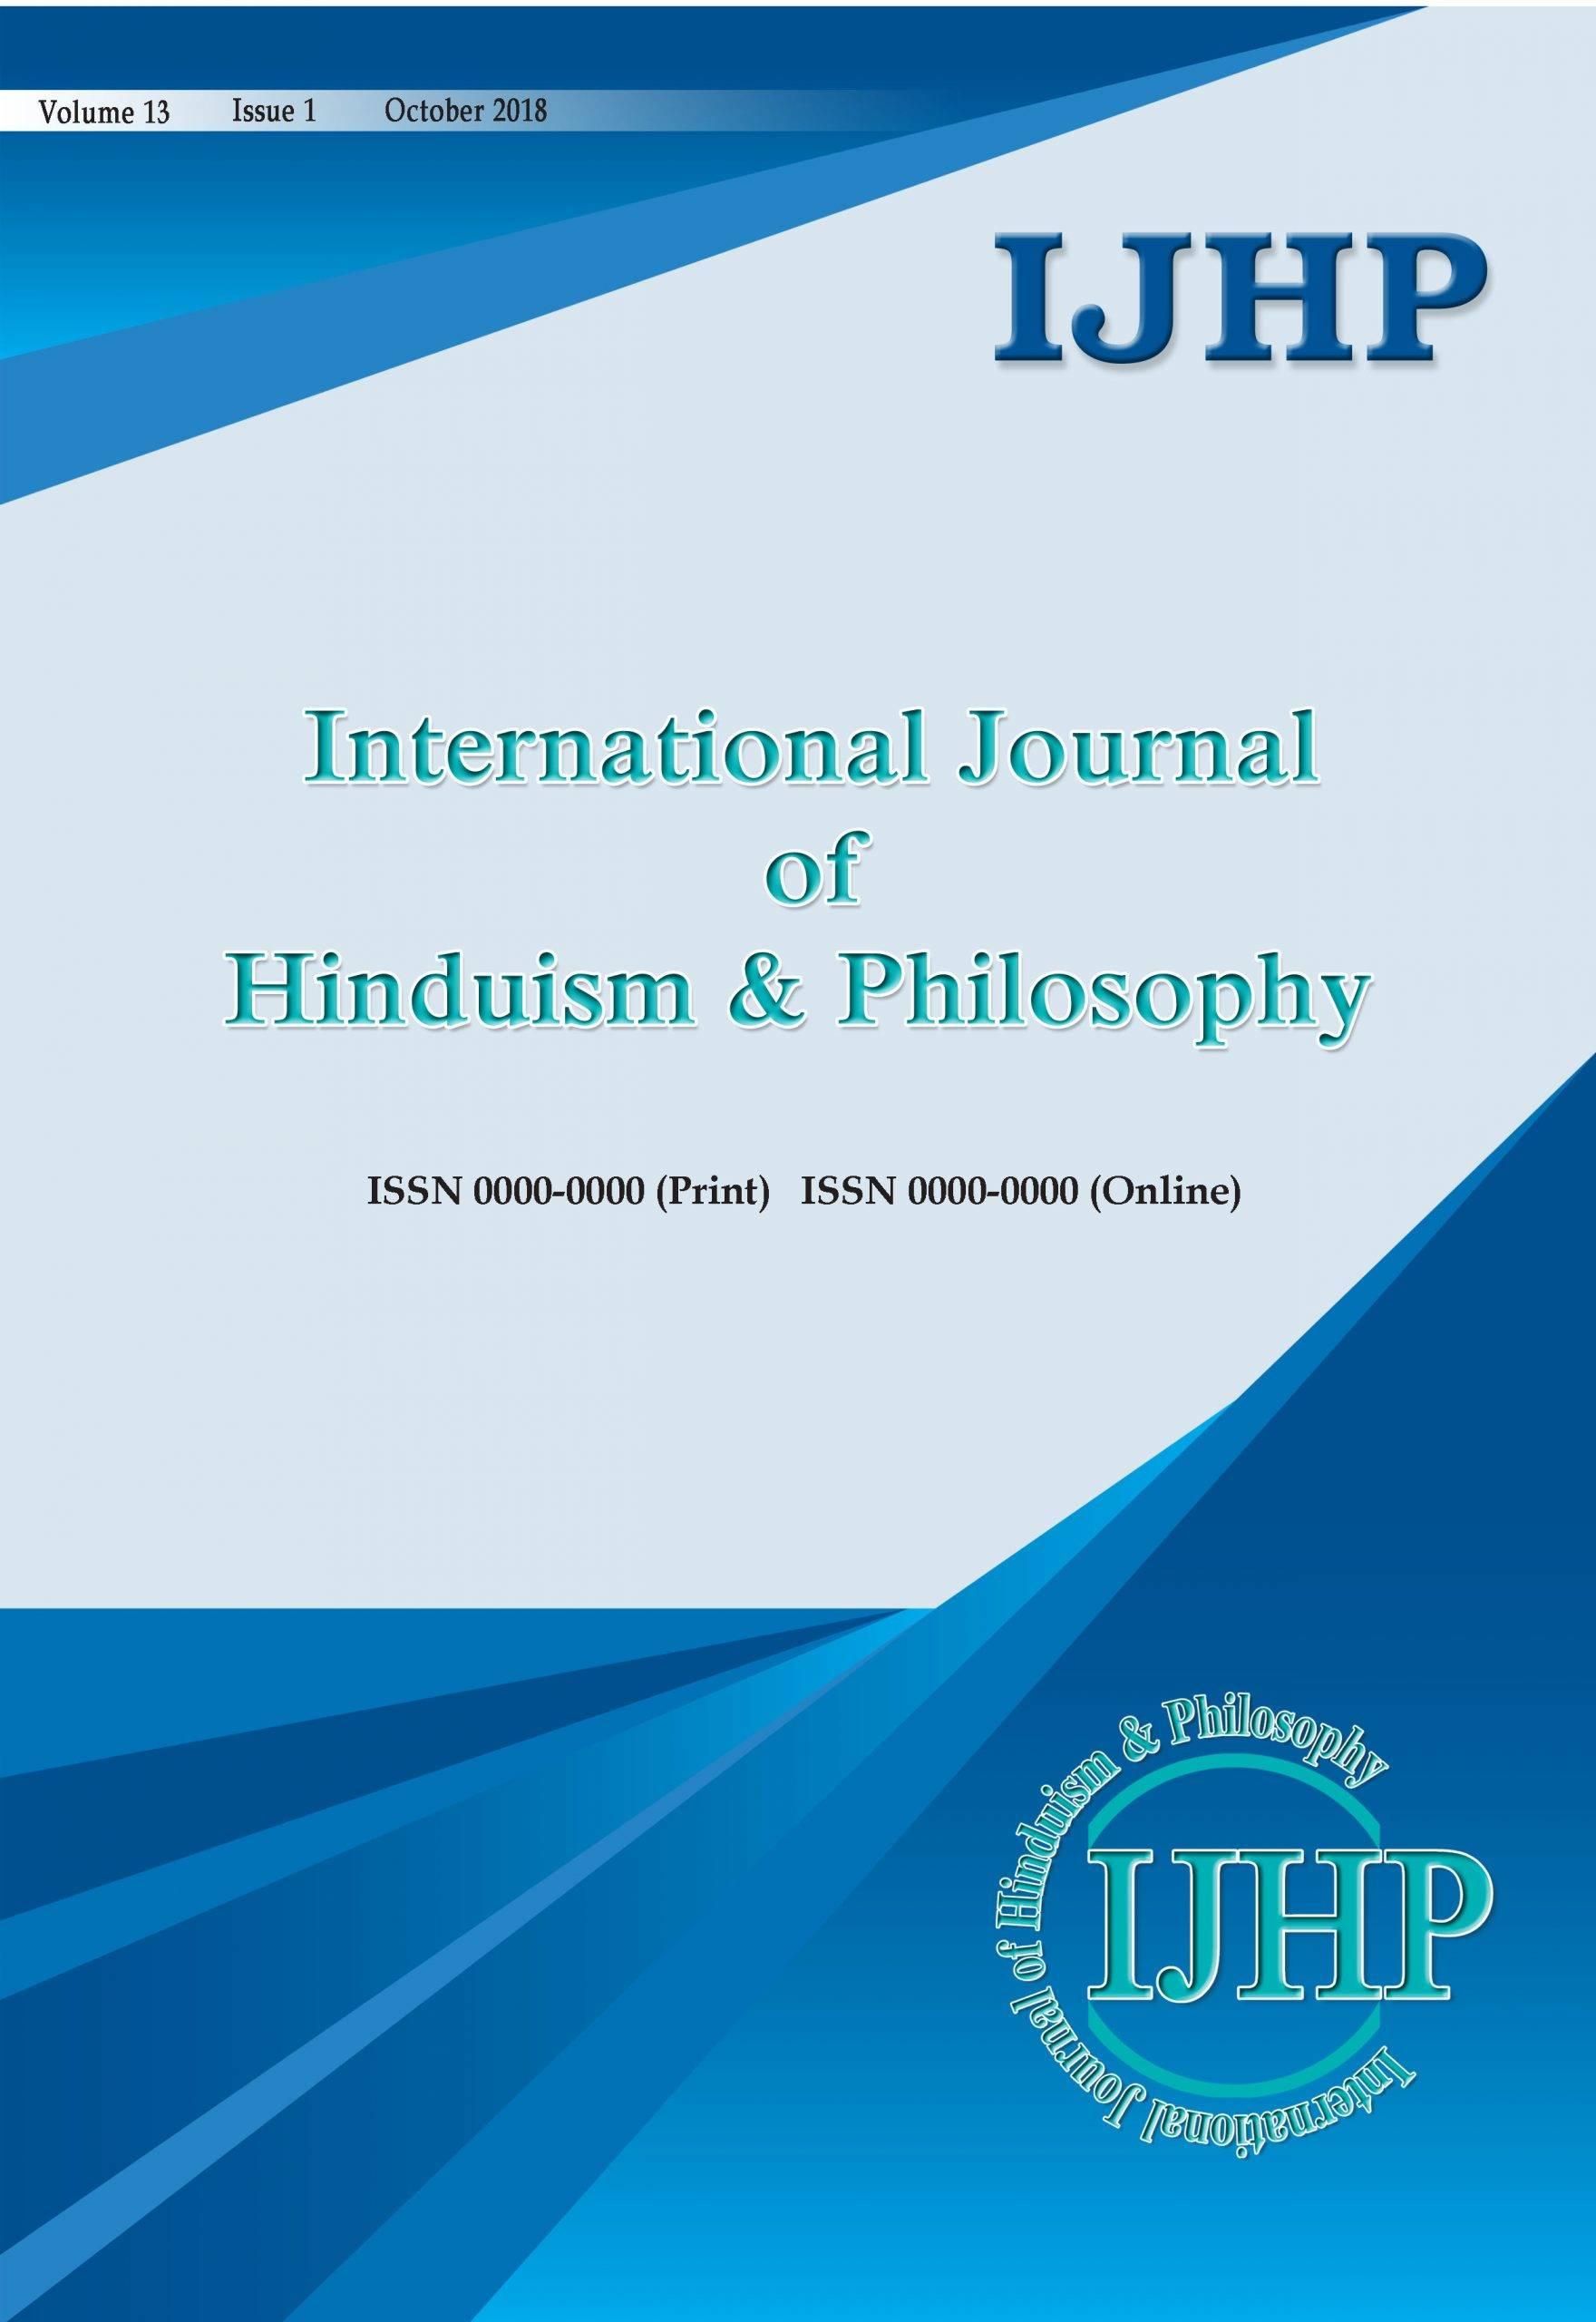 International Journal of Hinduism & Philosophy